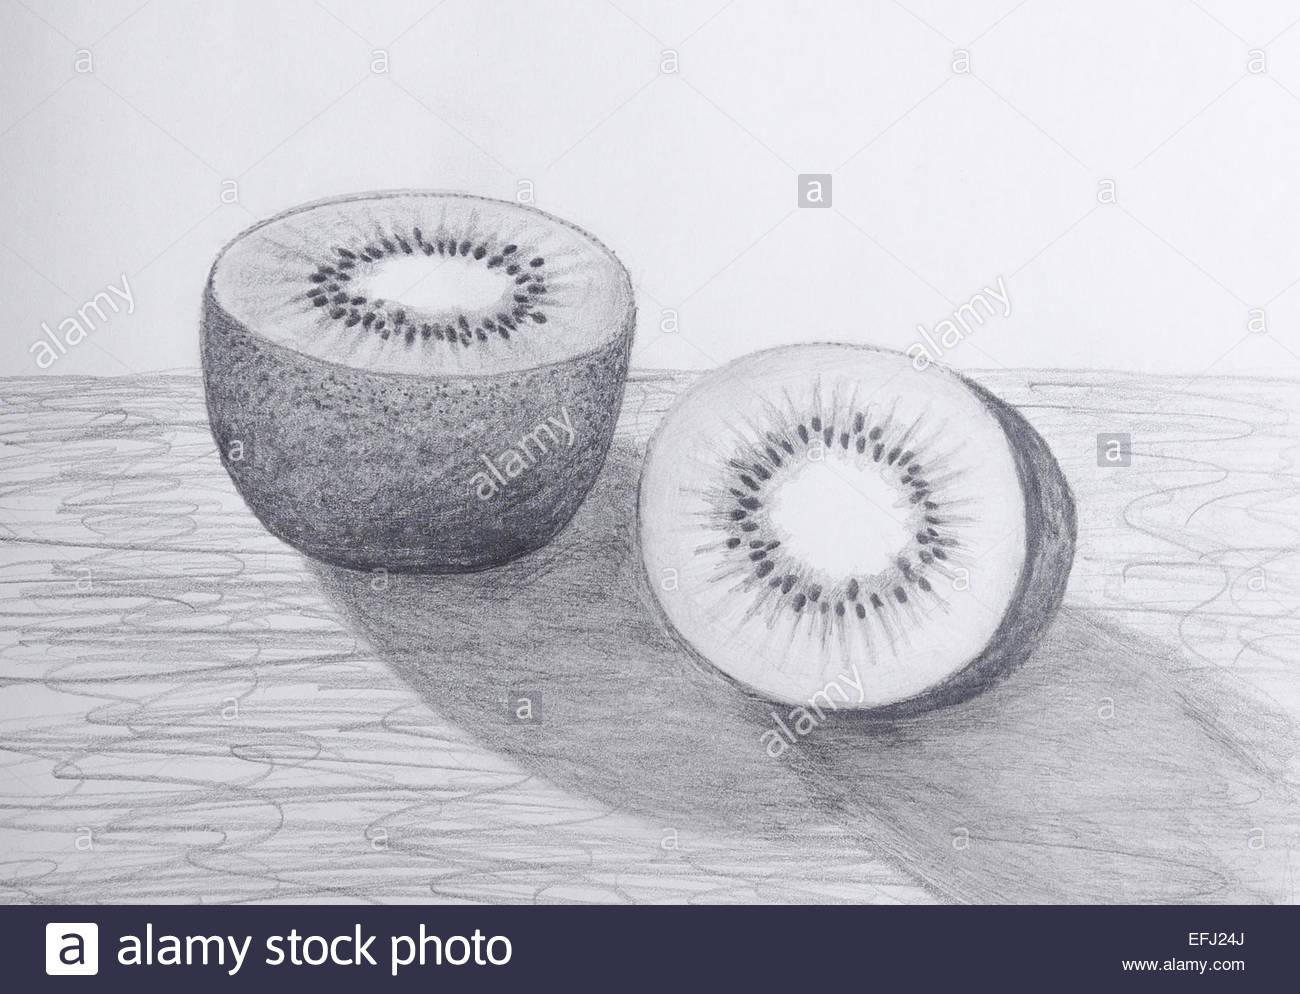 1300x994 Pencil Drawing Of A Sliced Kiwi Fruit